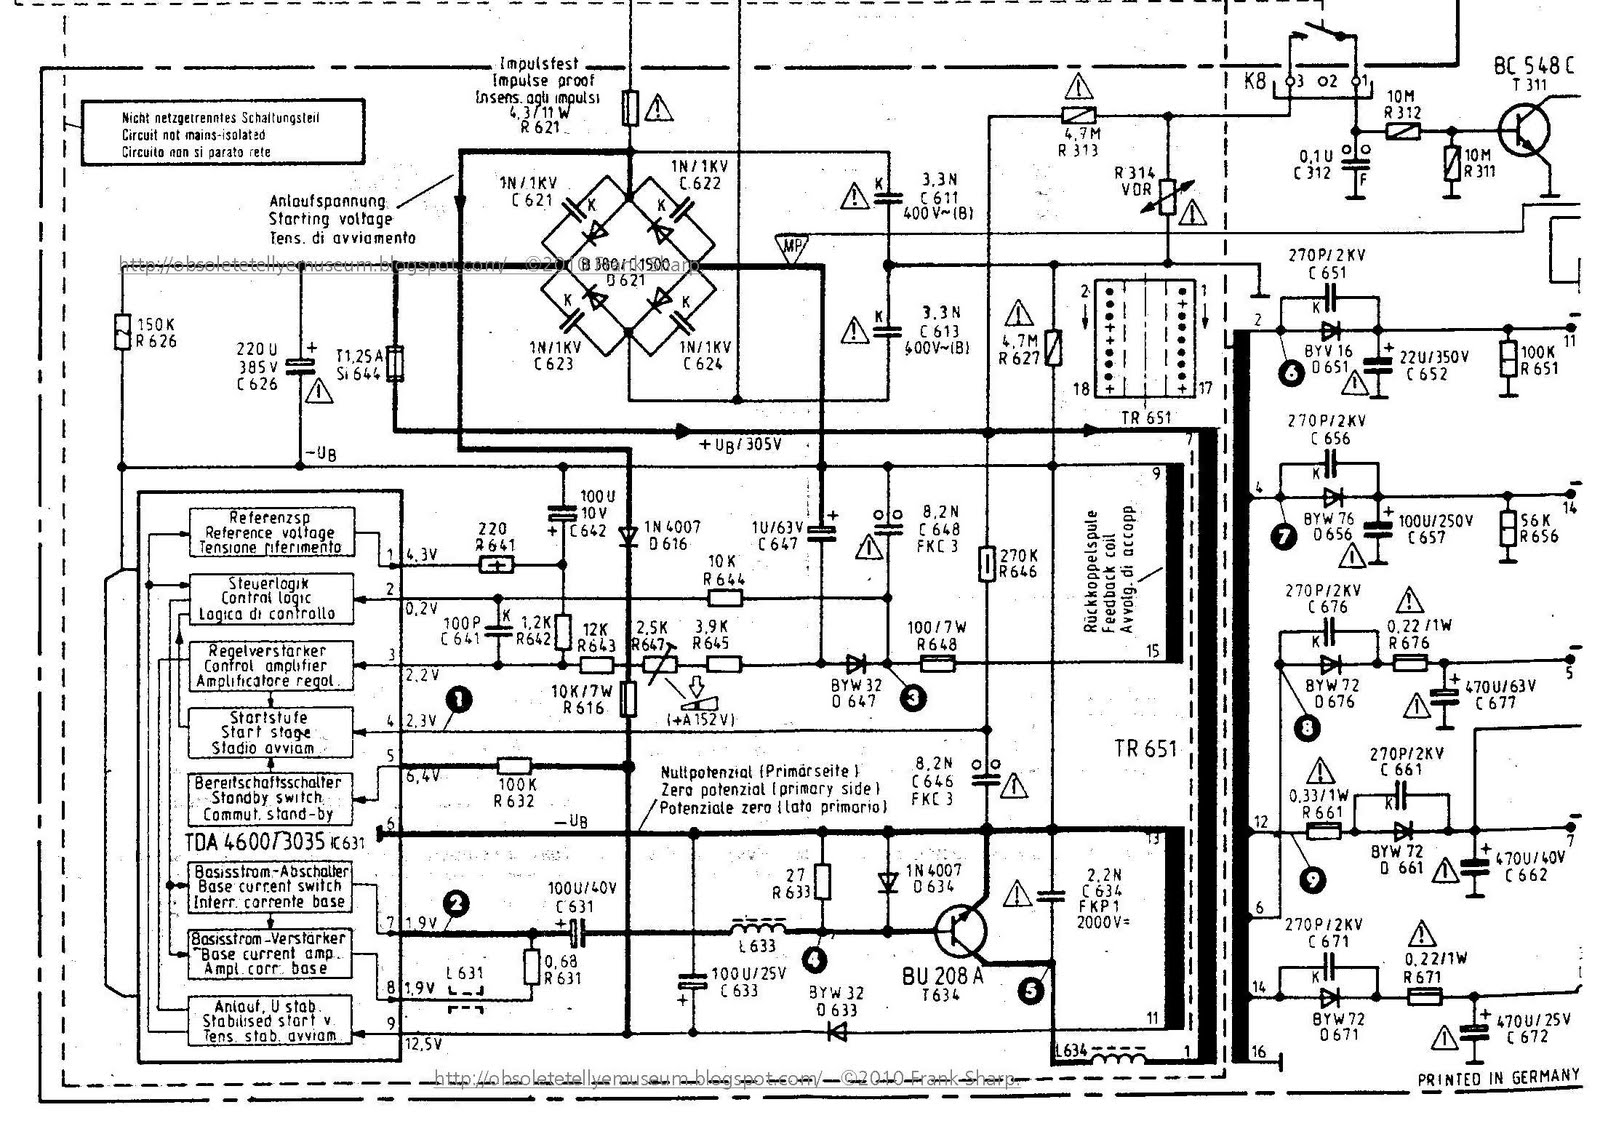 hight resolution of ifb washing machine motor wiring diagram wiring library rh 4 evitta de whirlpool washing machine model numbers whirlpool washing machine wiring diagram